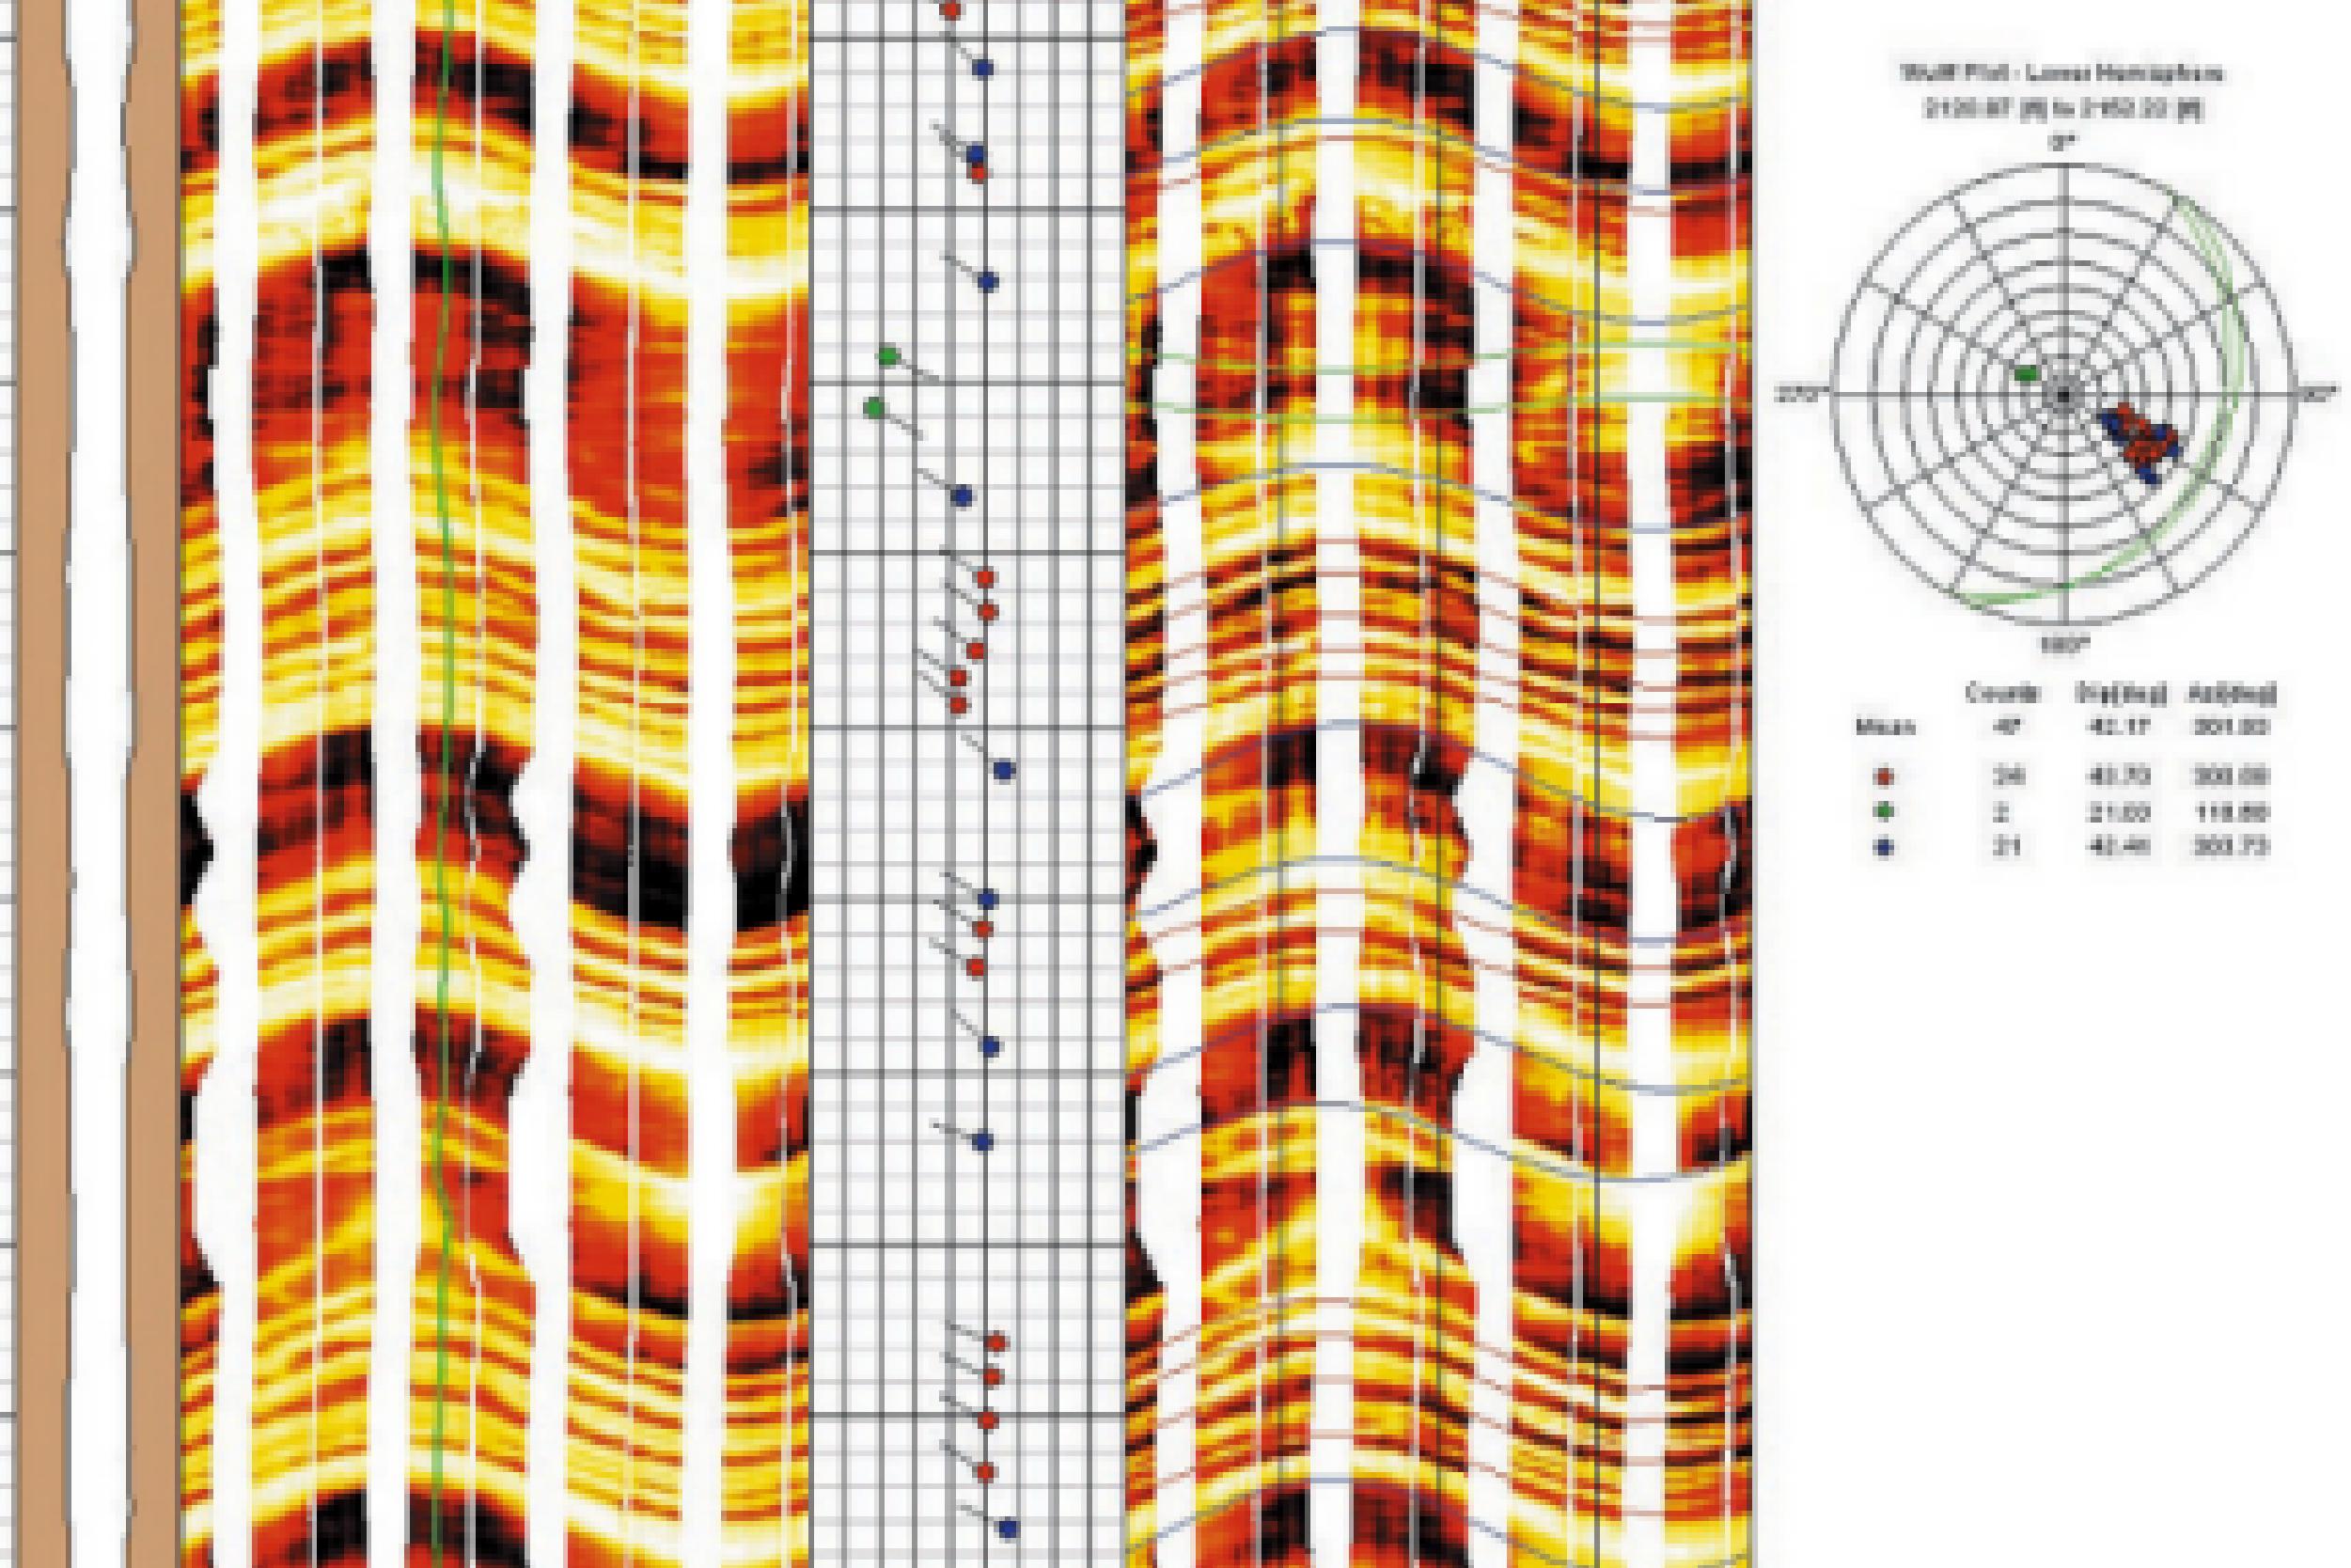 Visualizador de registros de pozo